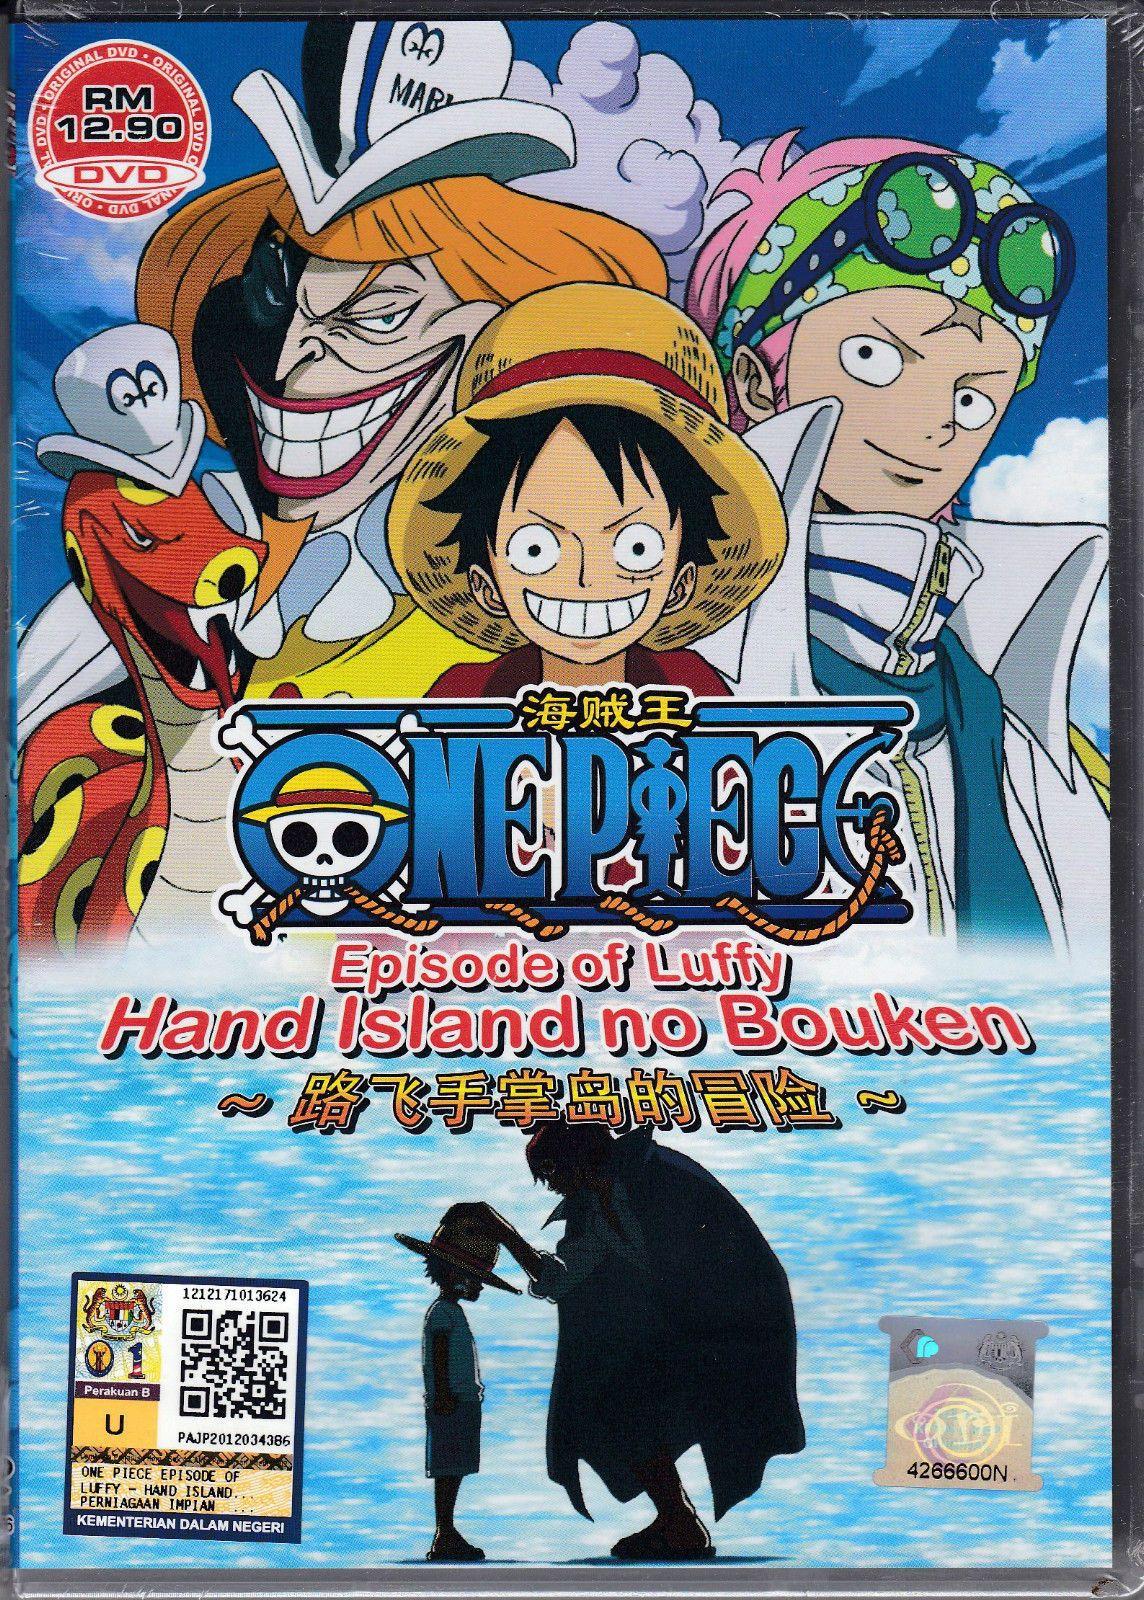 DVD ANIME FILM ONE PIECE Episode of Luffy Hand Island no ...